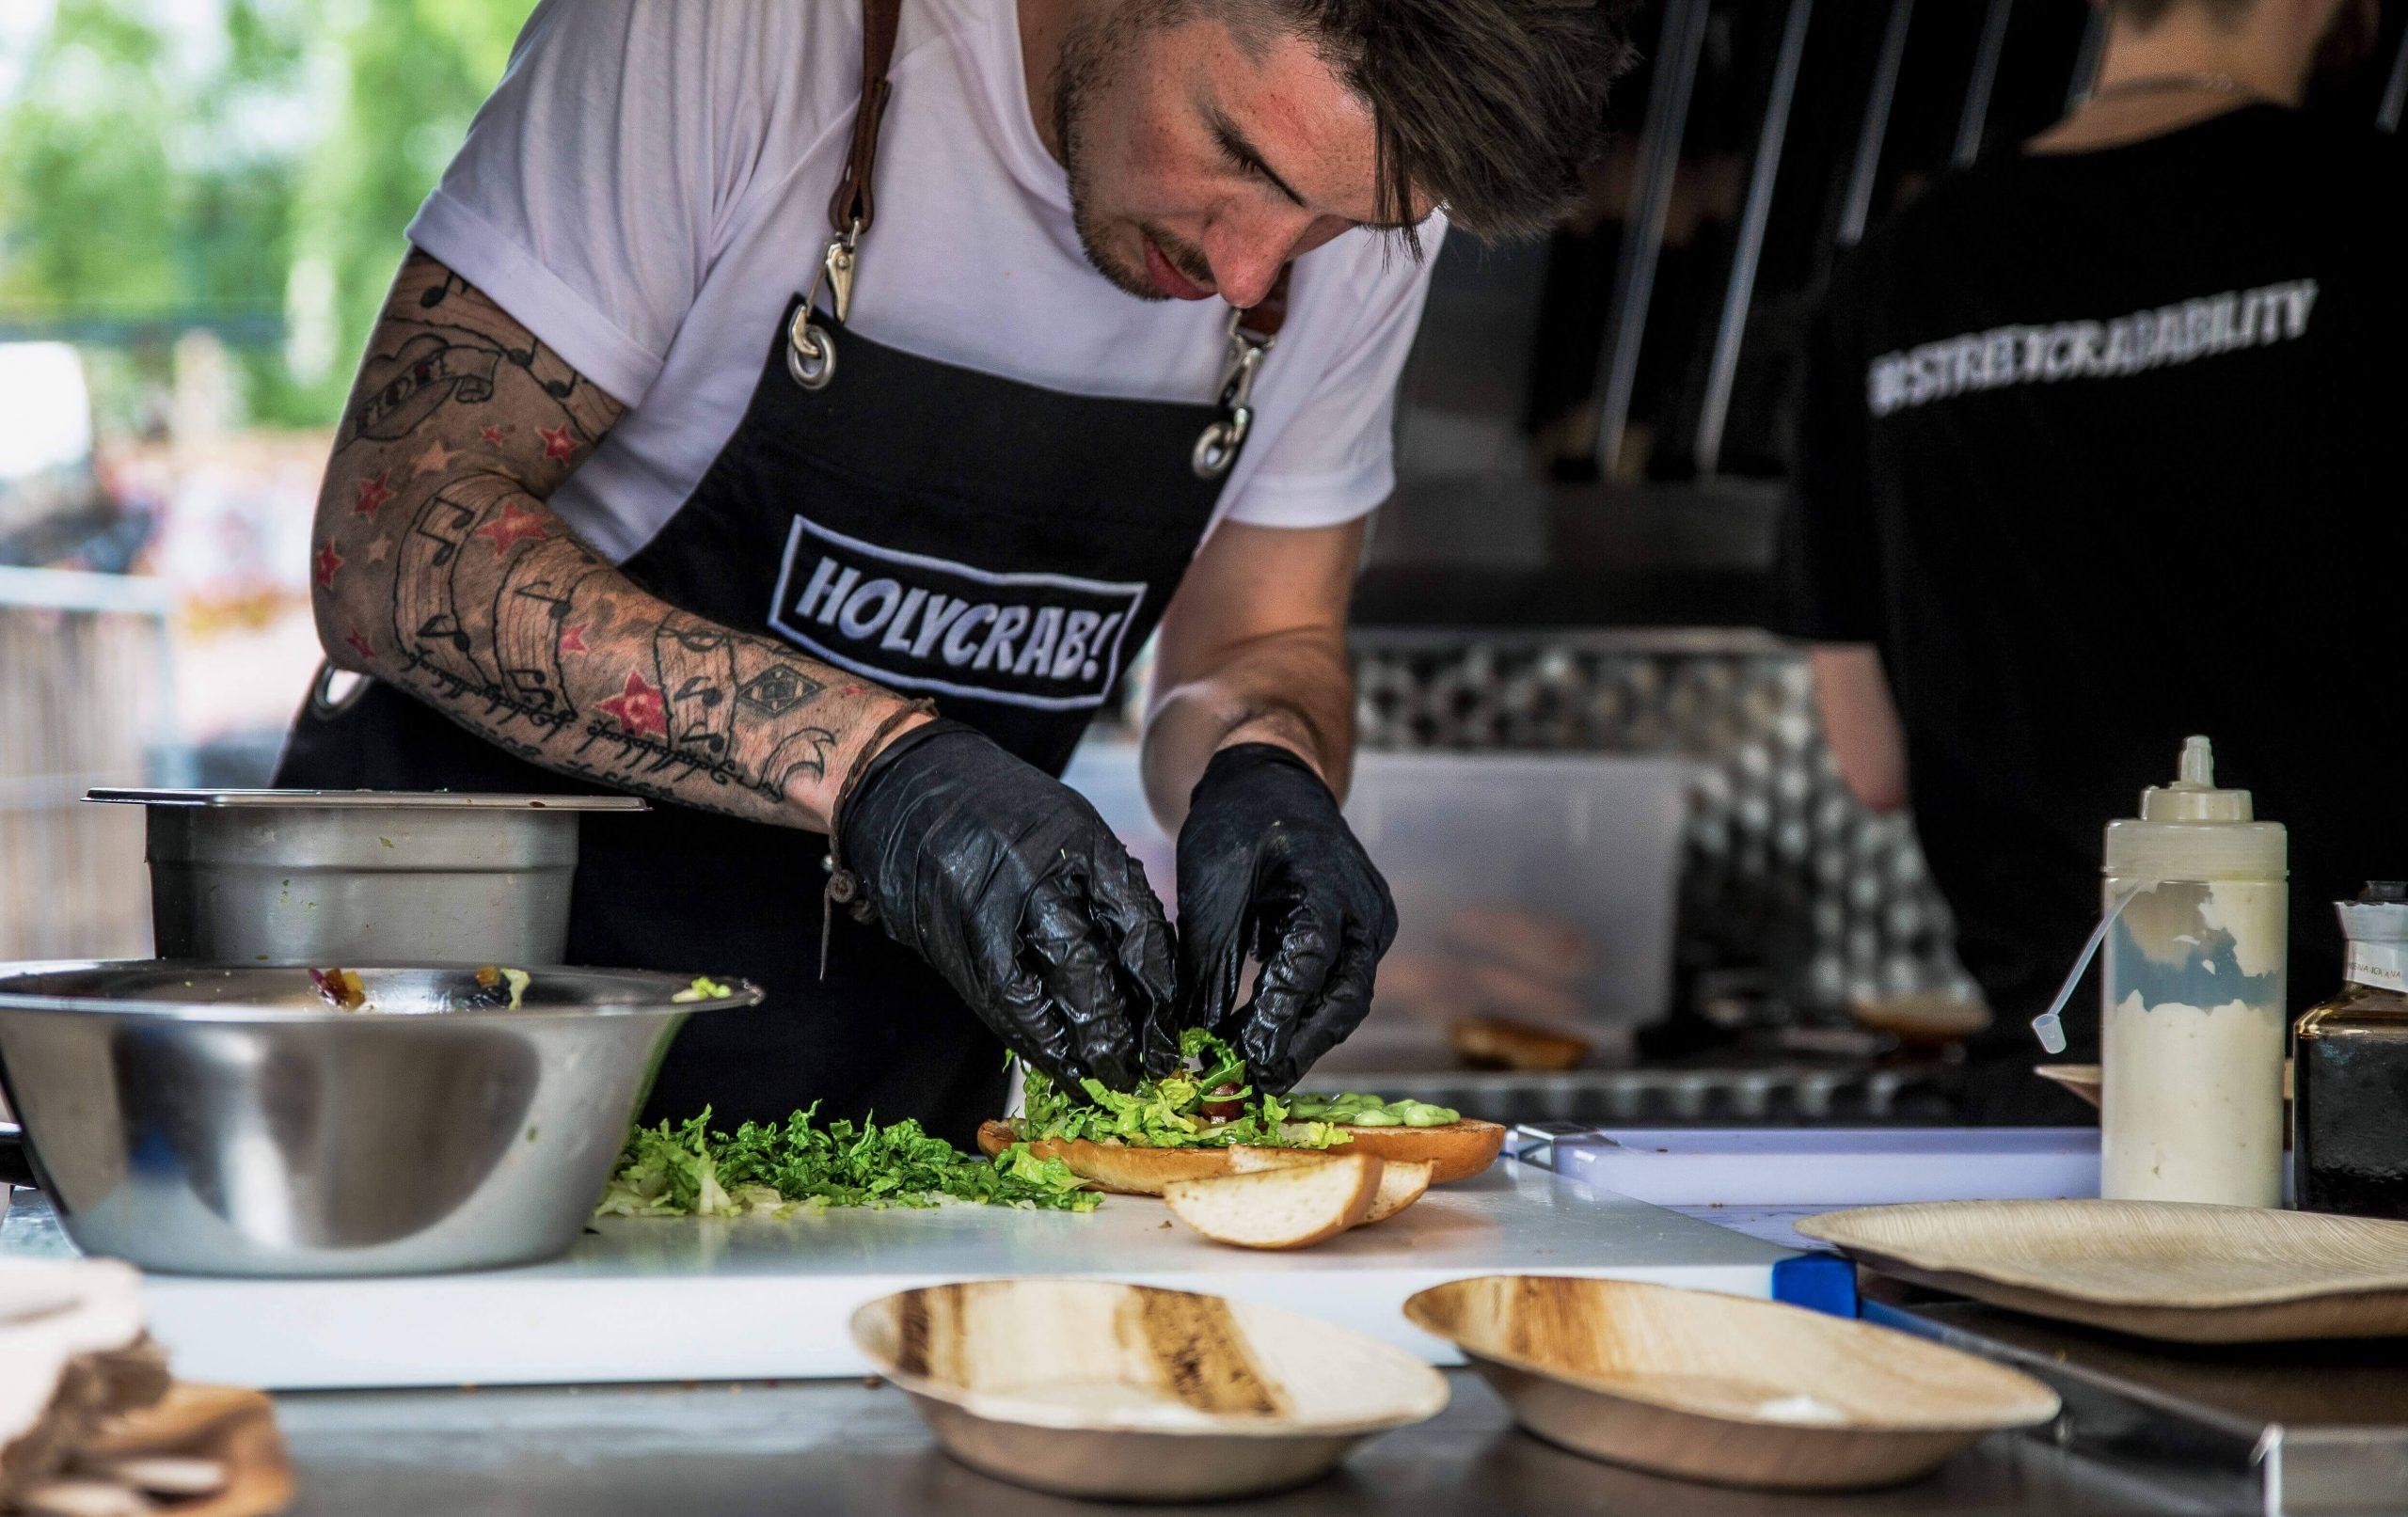 HolyCrab Food Truck Gastro Start up